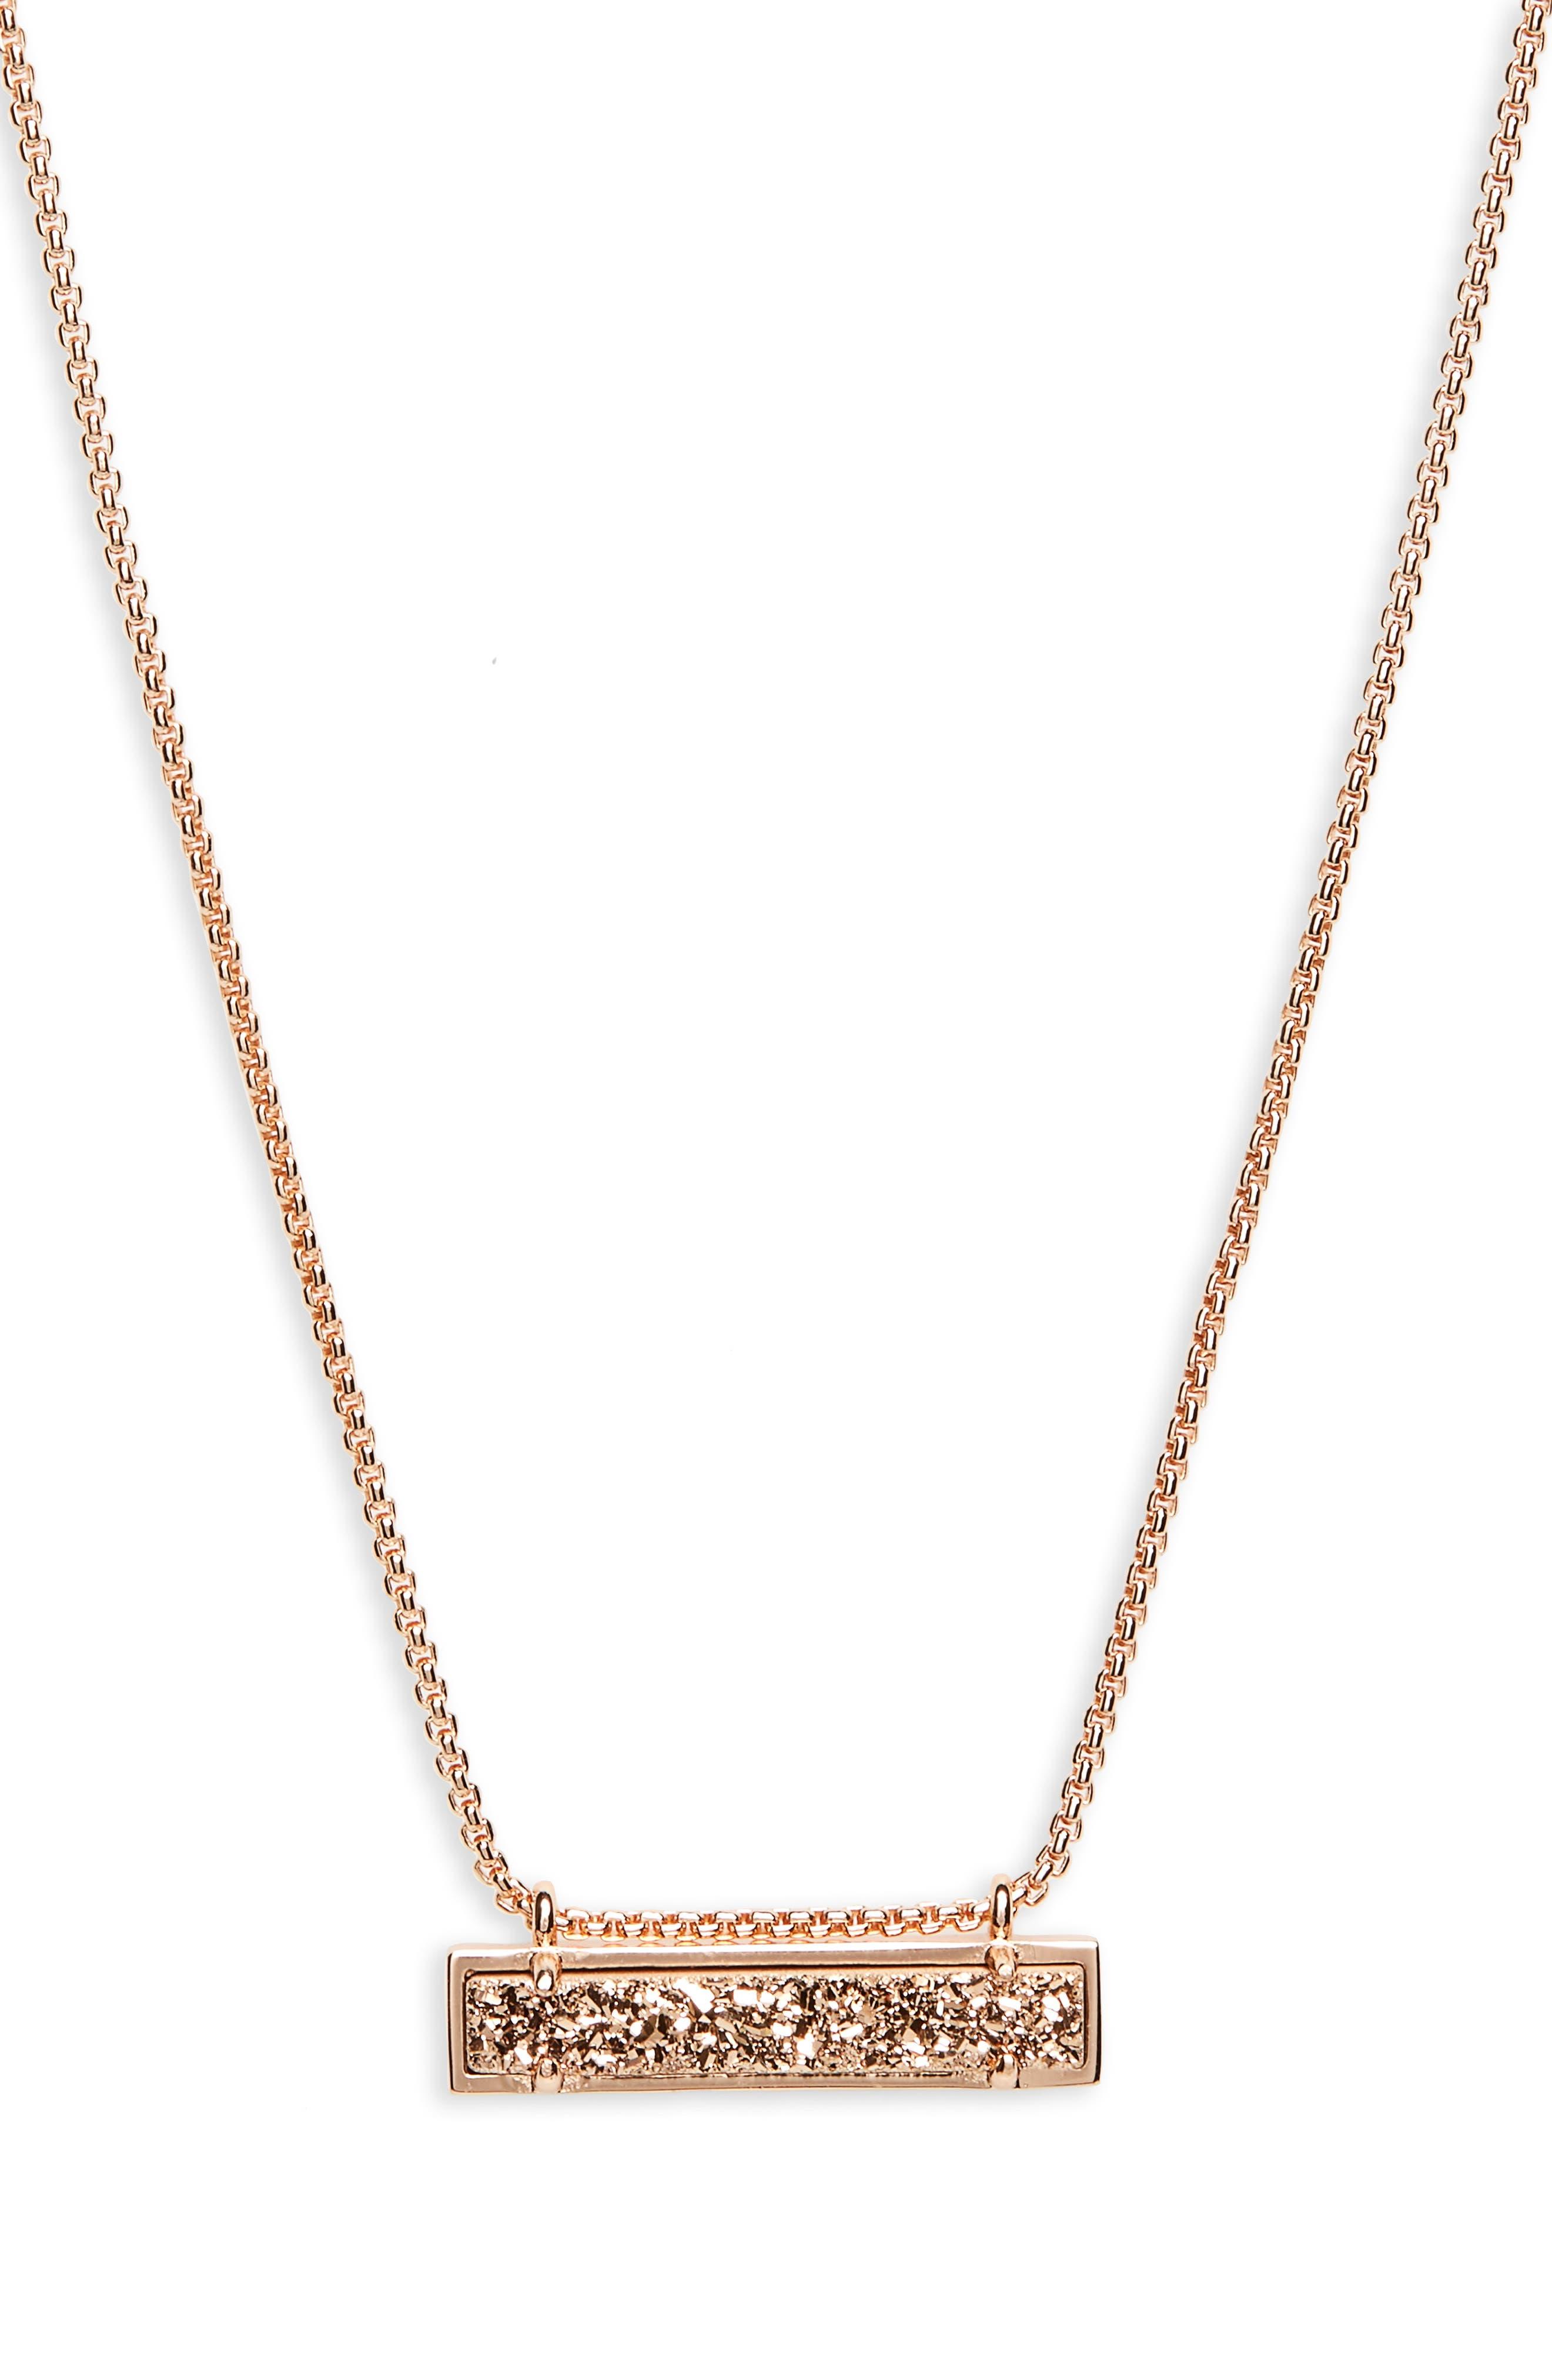 KENDRA SCOTT Leanor Pendant Necklace